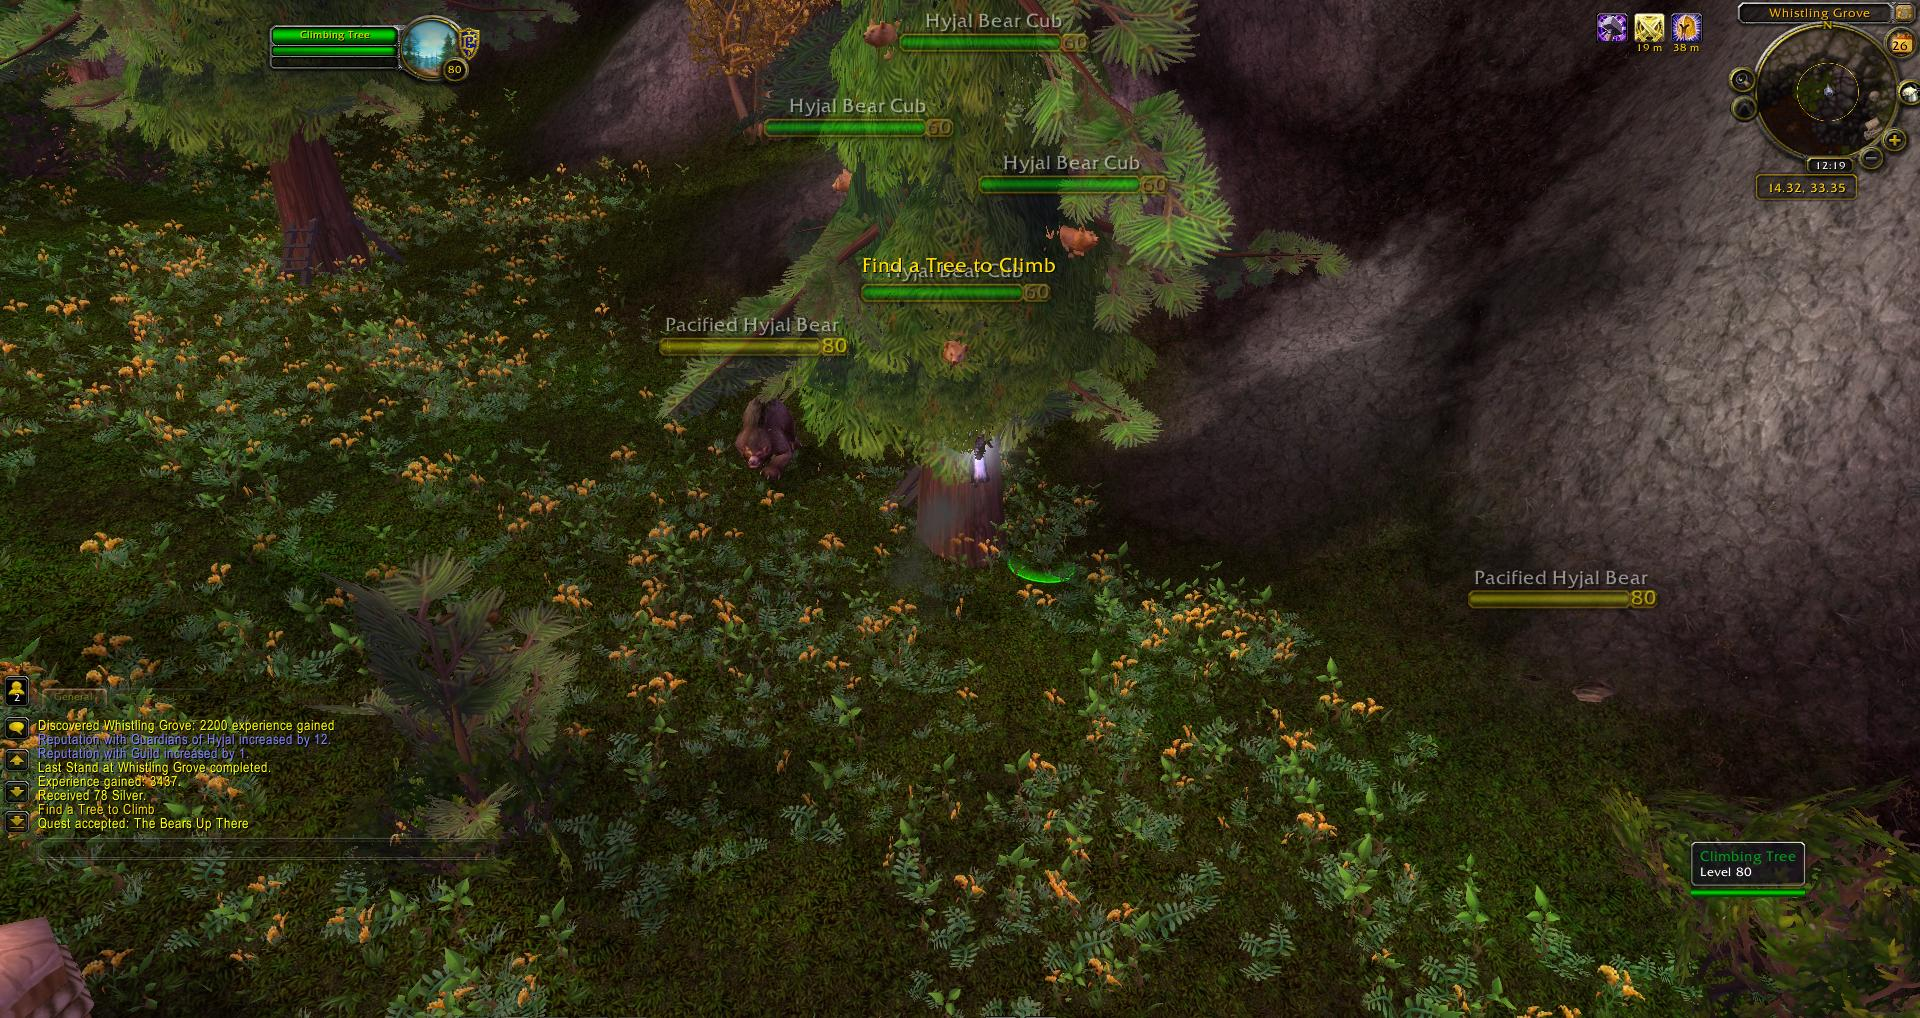 Mount Hyjal Whistling Grove Wow Screenshot Gamingcfgcom